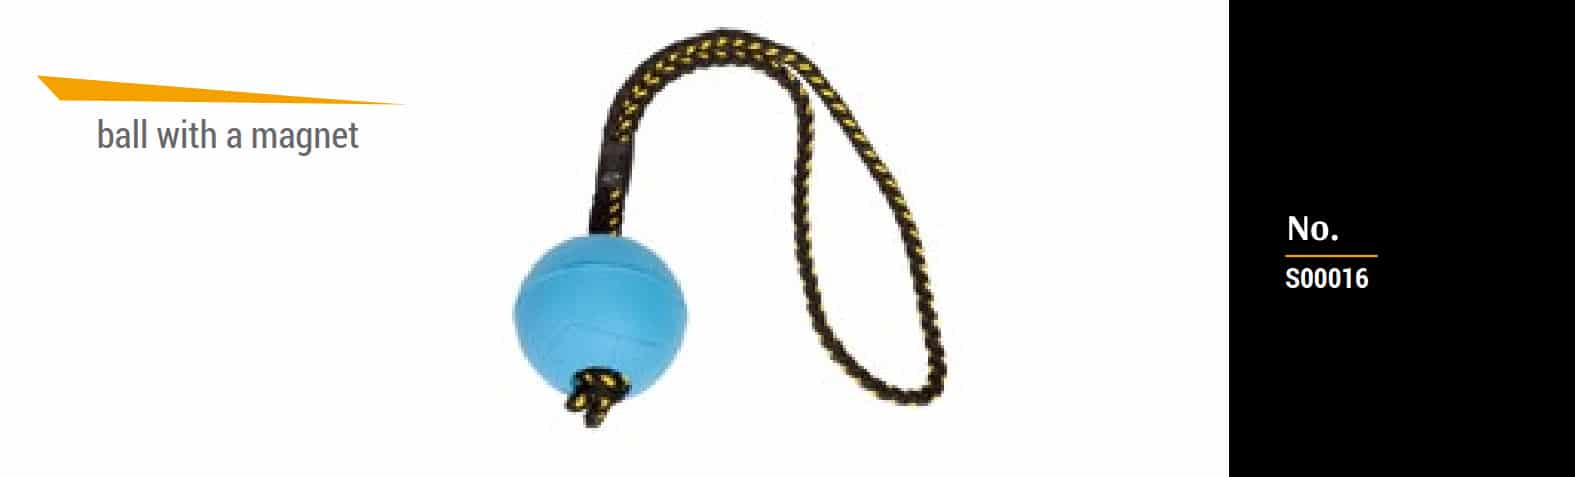 Gumijasta žoga z magnetom 6